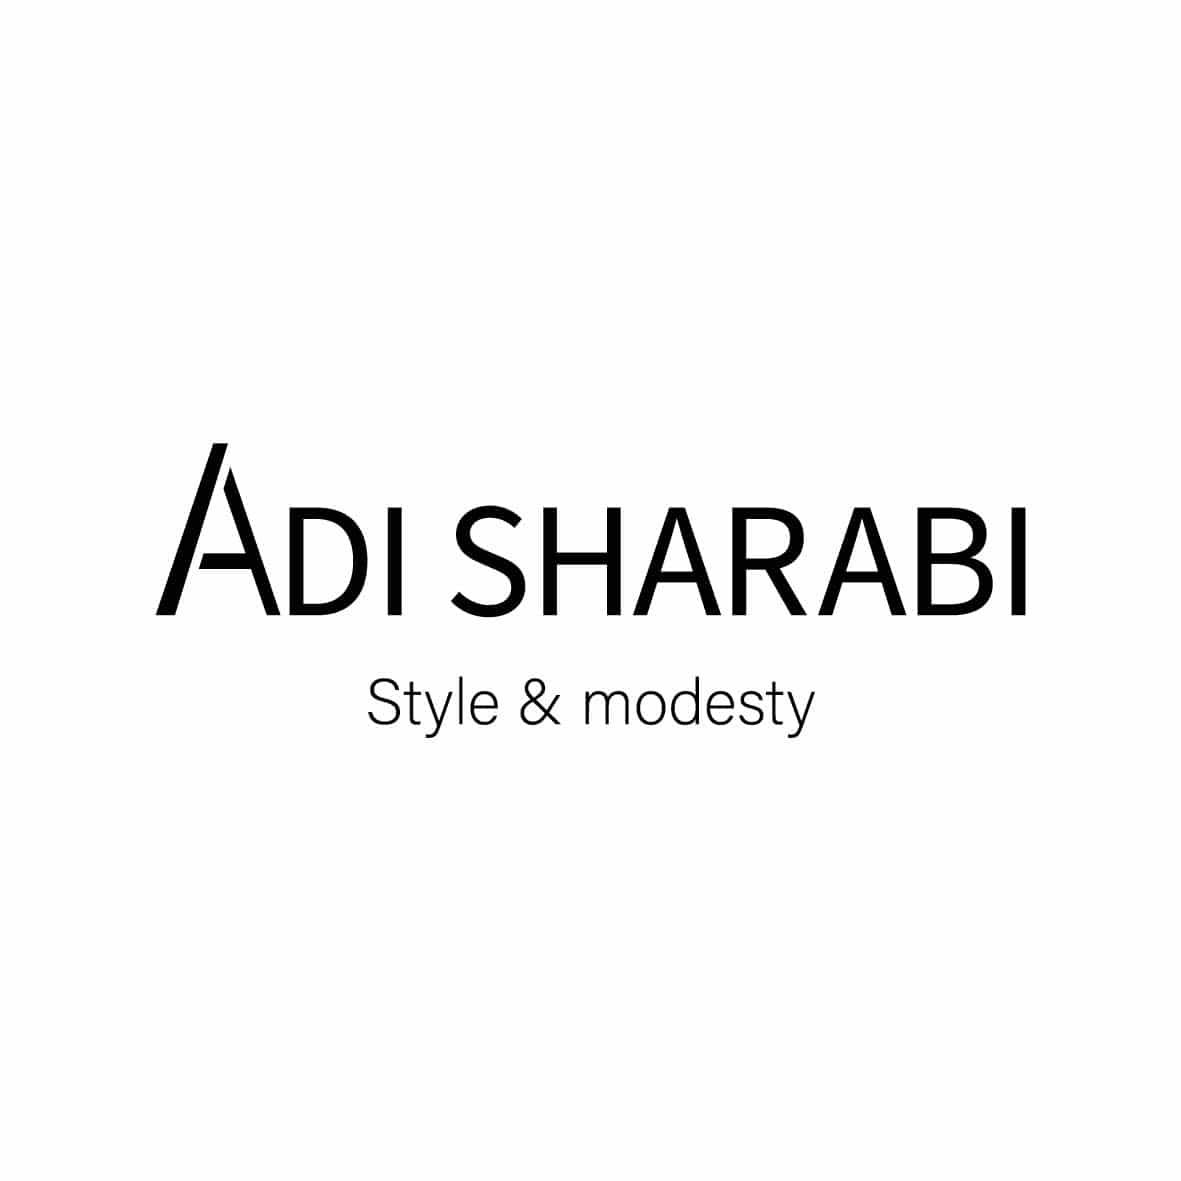 adi sharabi